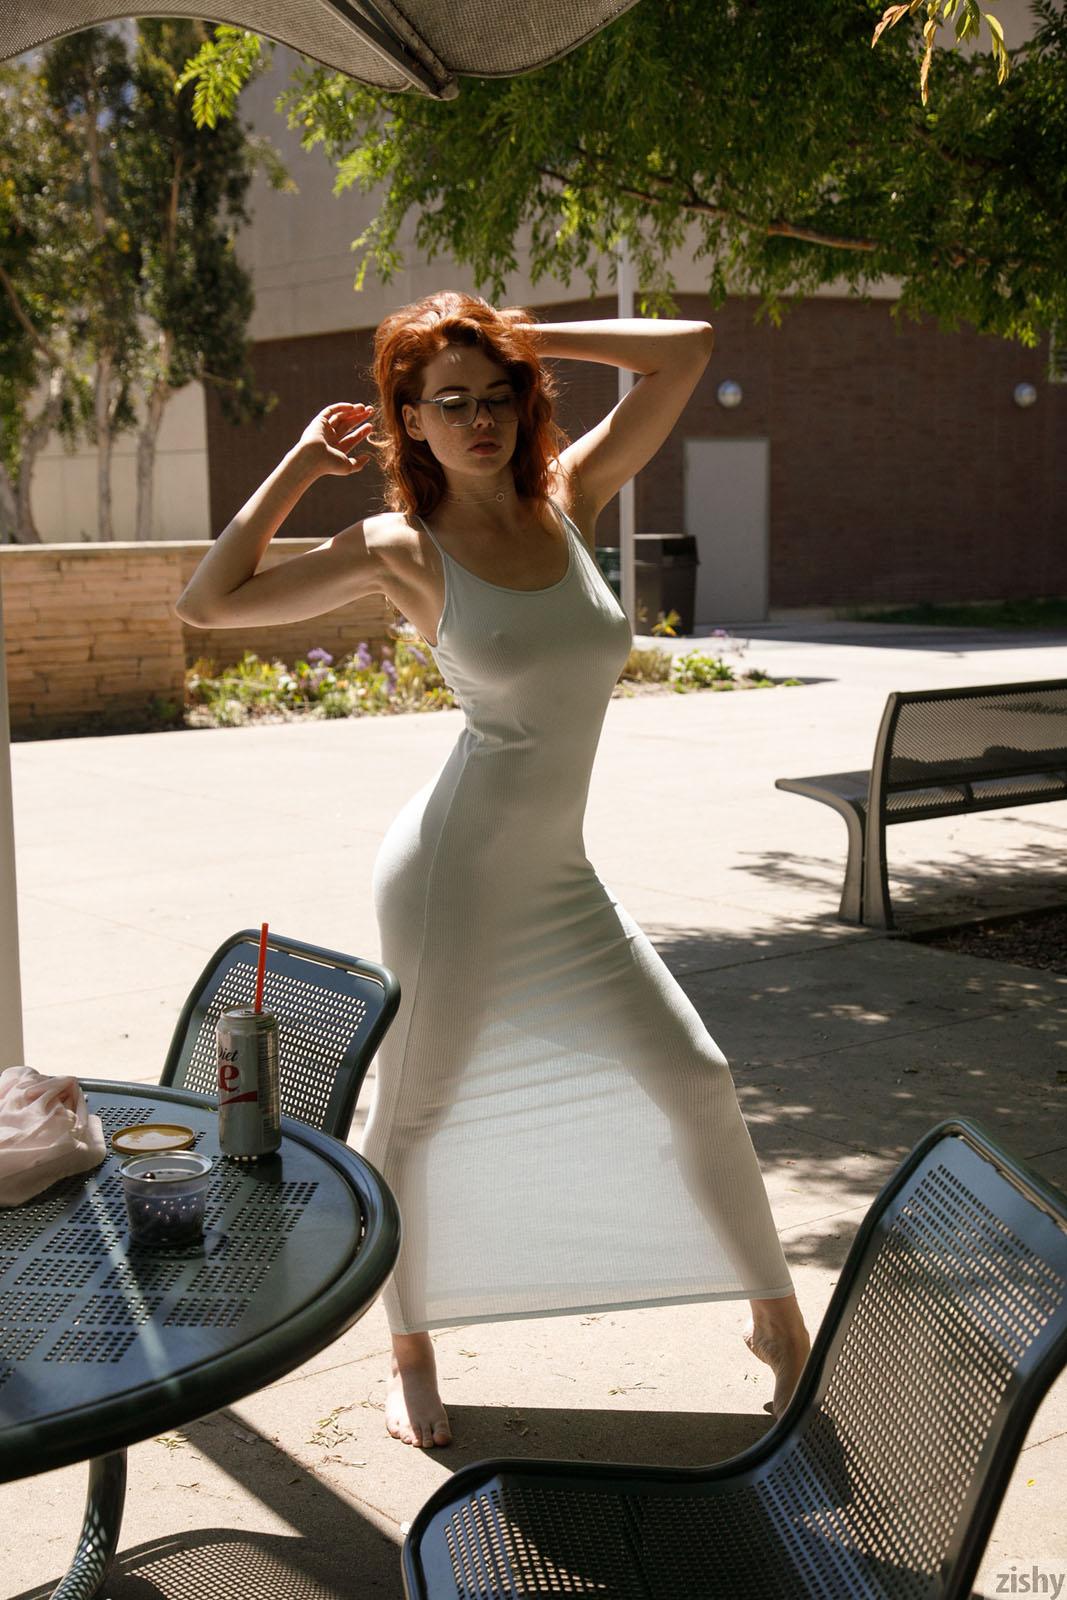 Sabrina Lynn Pleasure Zishy nude pics  Bunnylustcom